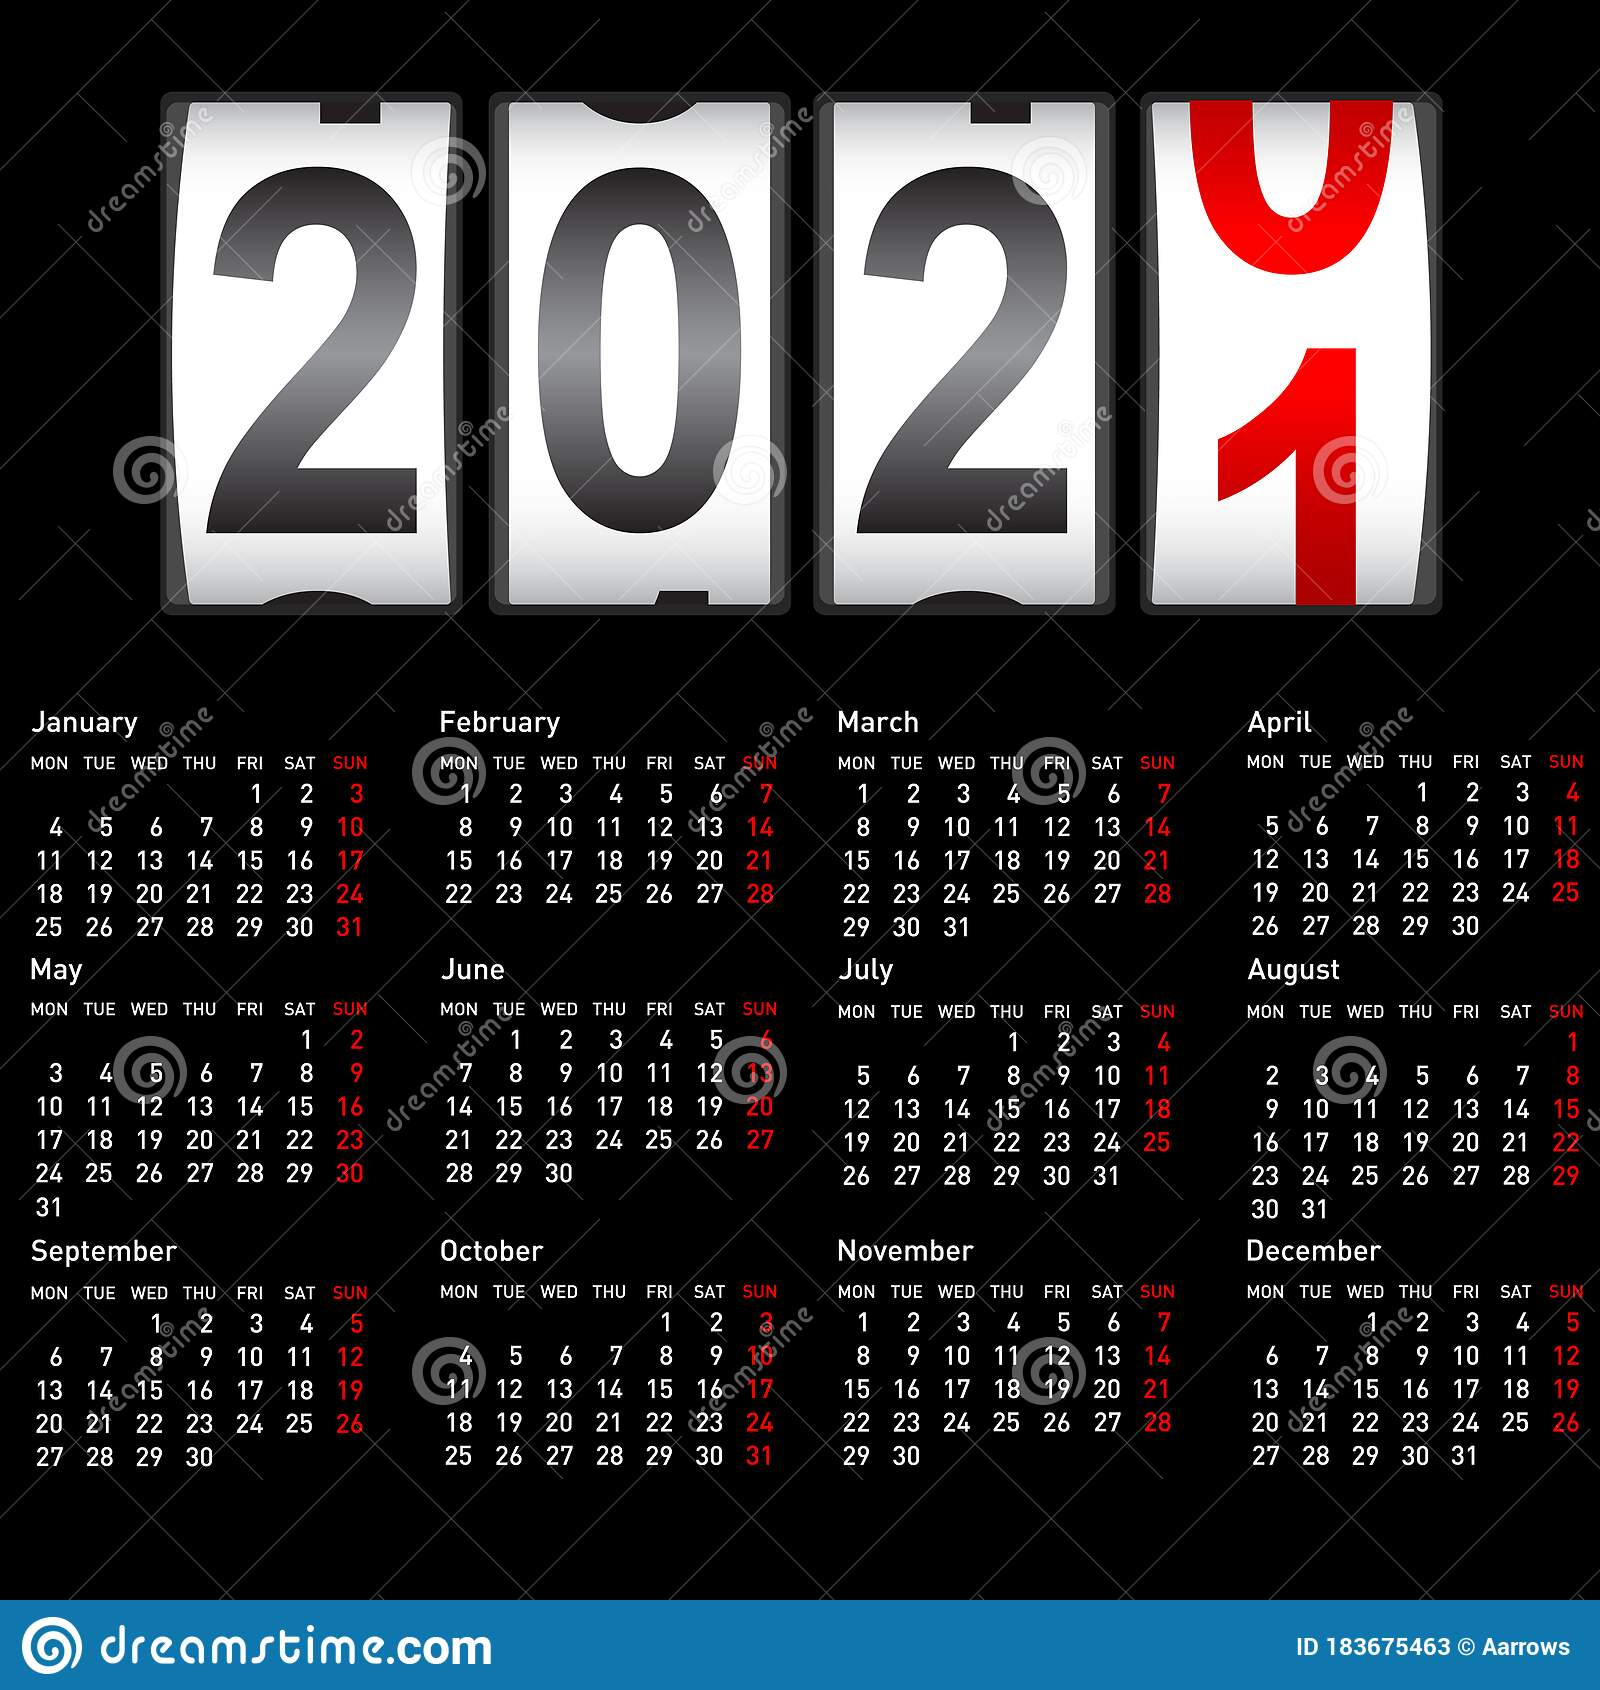 2021 New Year Counter Change Calendar Illustration Stock 1